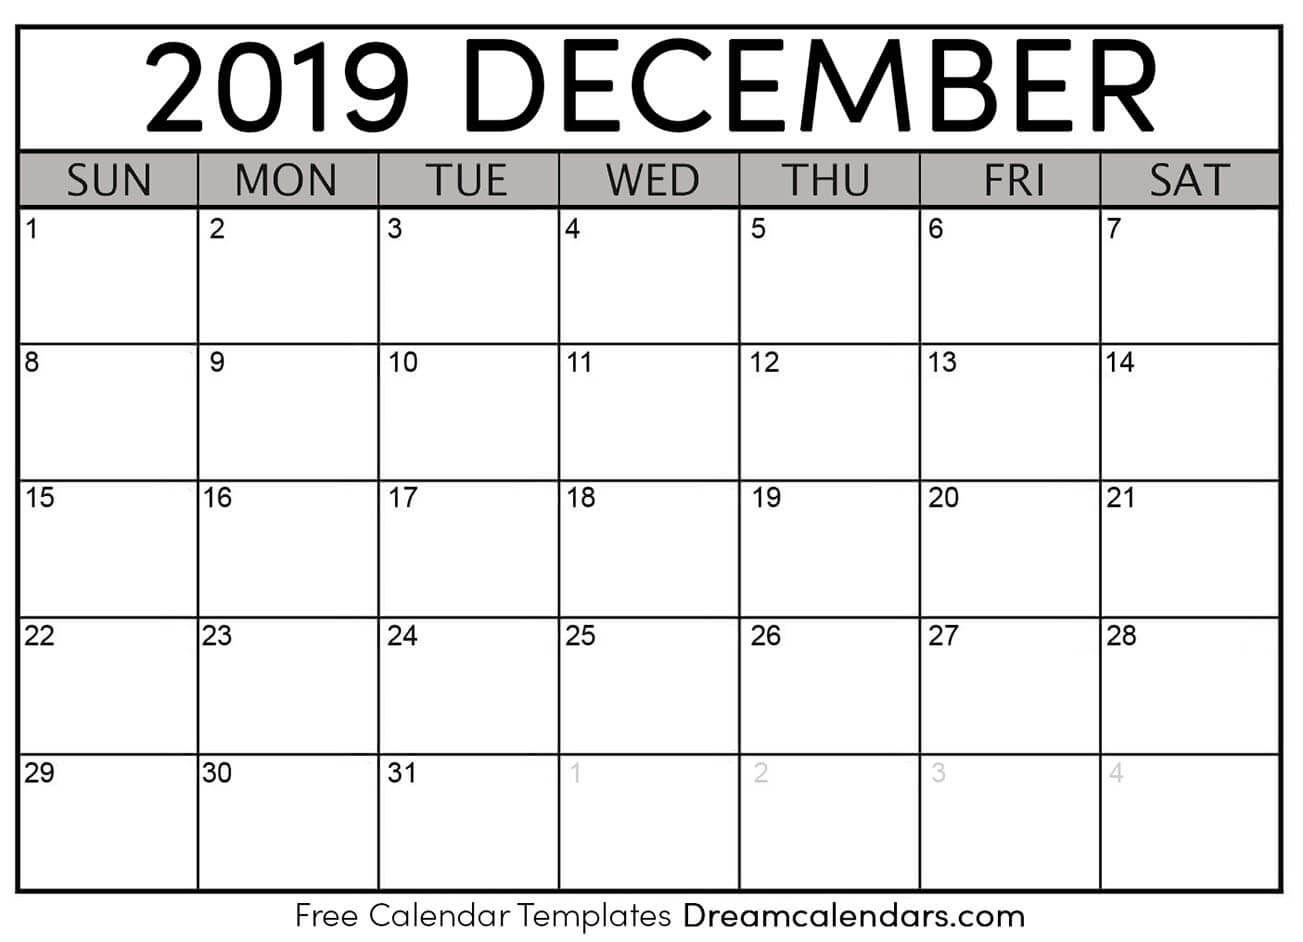 December 2019 Calendar | Free Blank Printable Templates